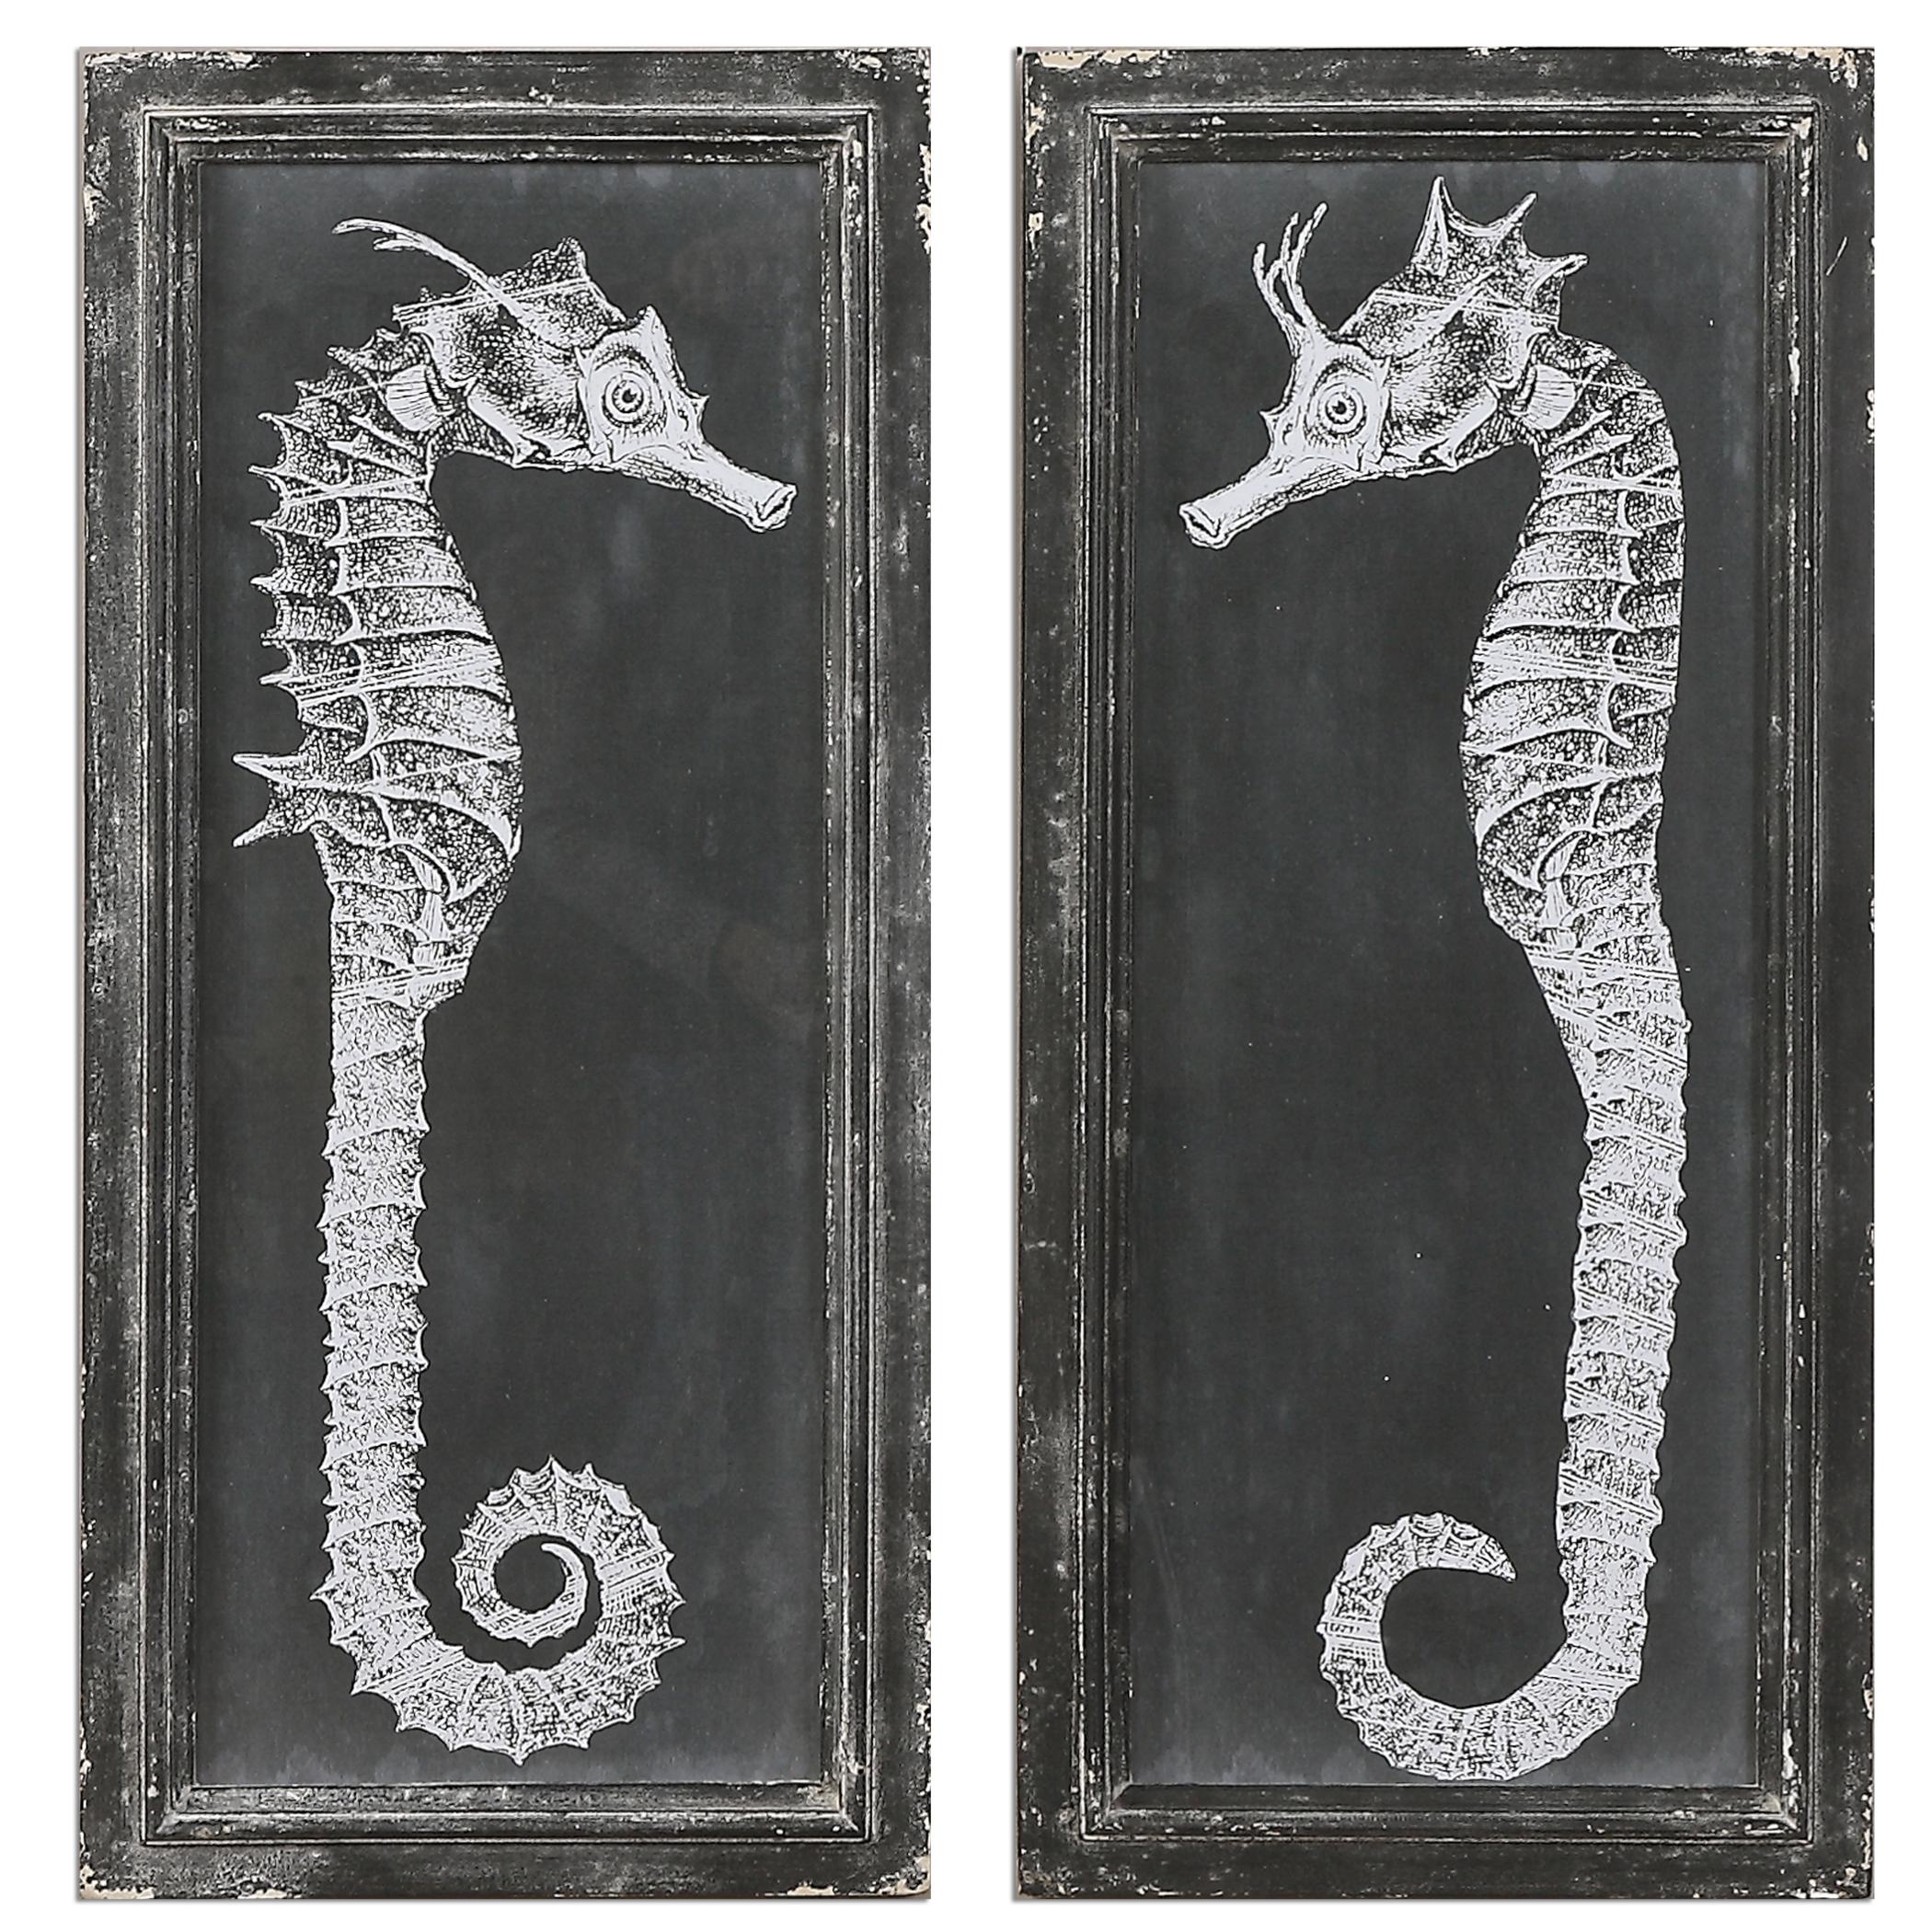 Uttermost Art Seahorse Blueprints Art S/2 - Item Number: 56062